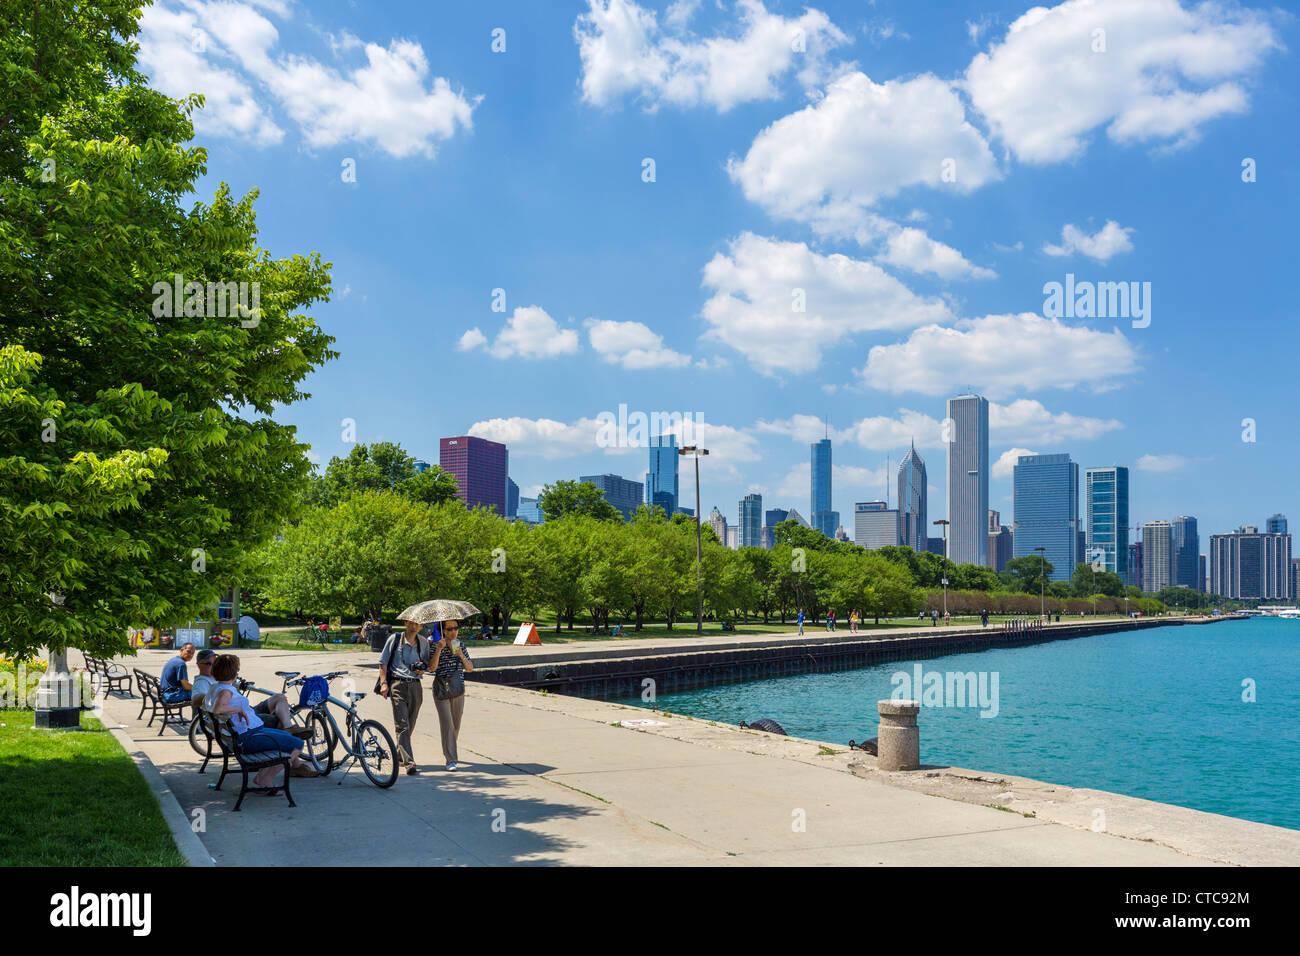 Chicago Lakefront Imágenes De Stock & Chicago Lakefront Fotos De ...